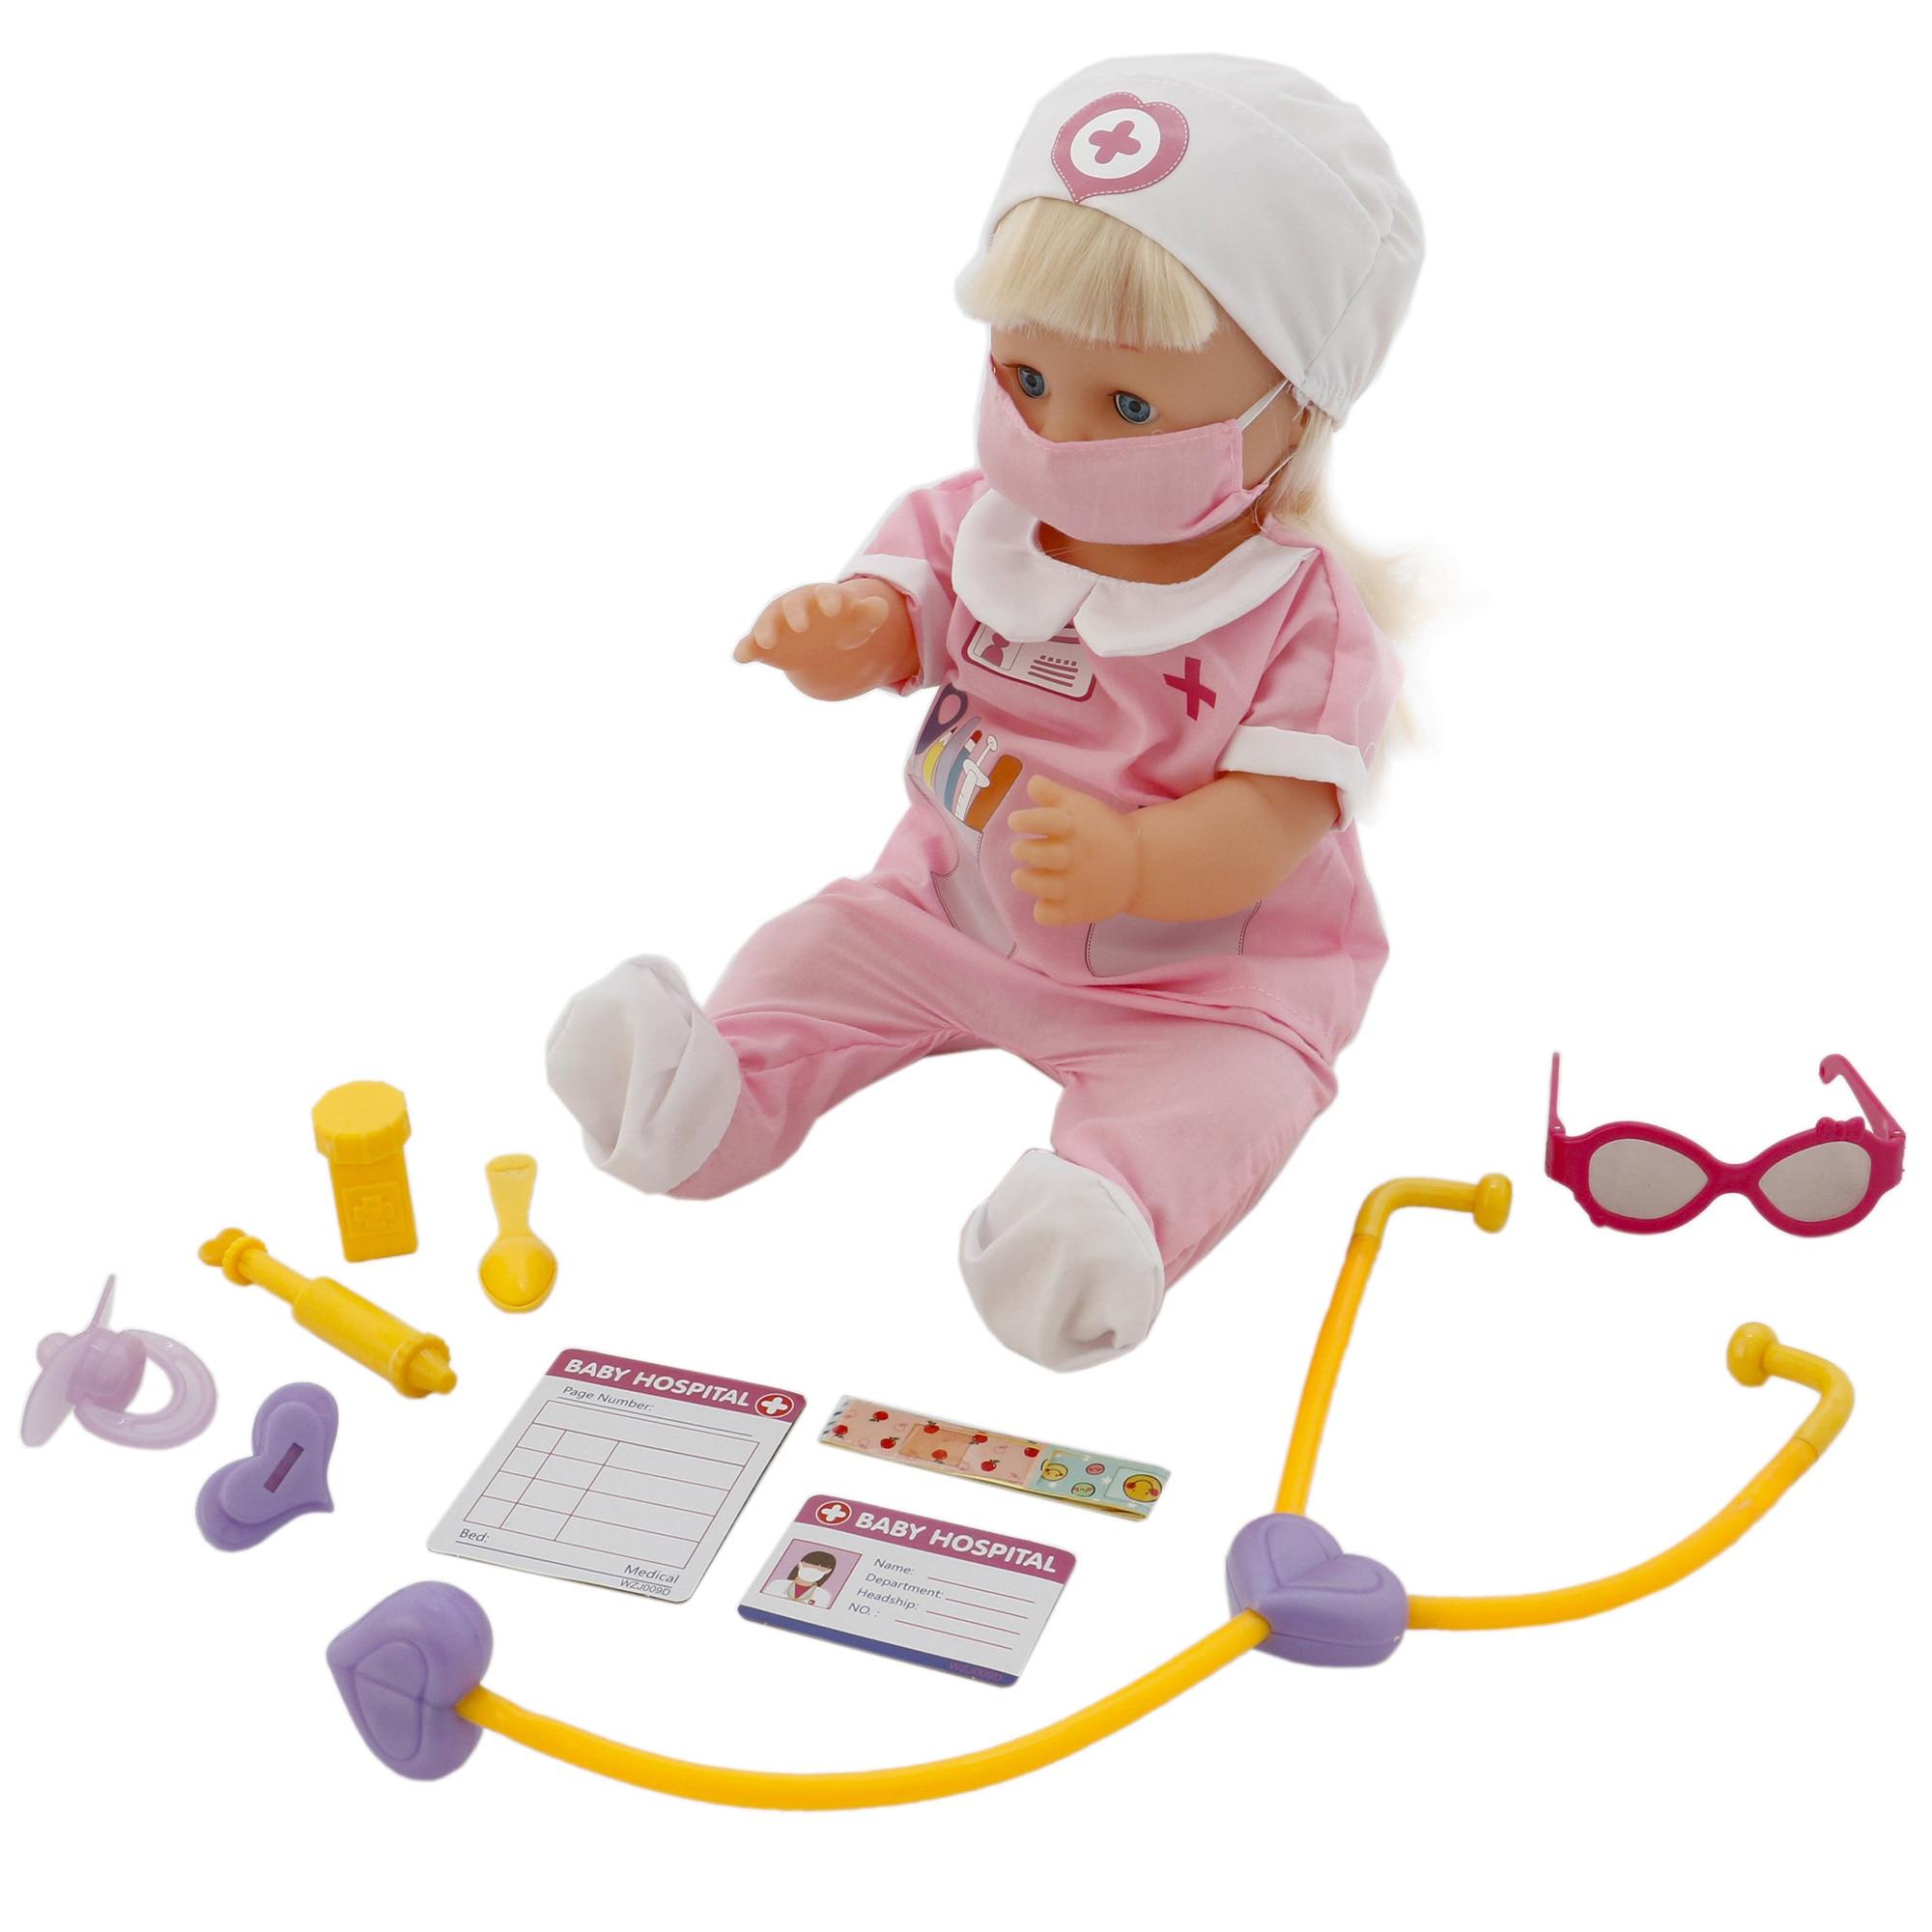 Fotografie Papusa M-Toys Sara cu functii si accesorii doctor, 40 cm